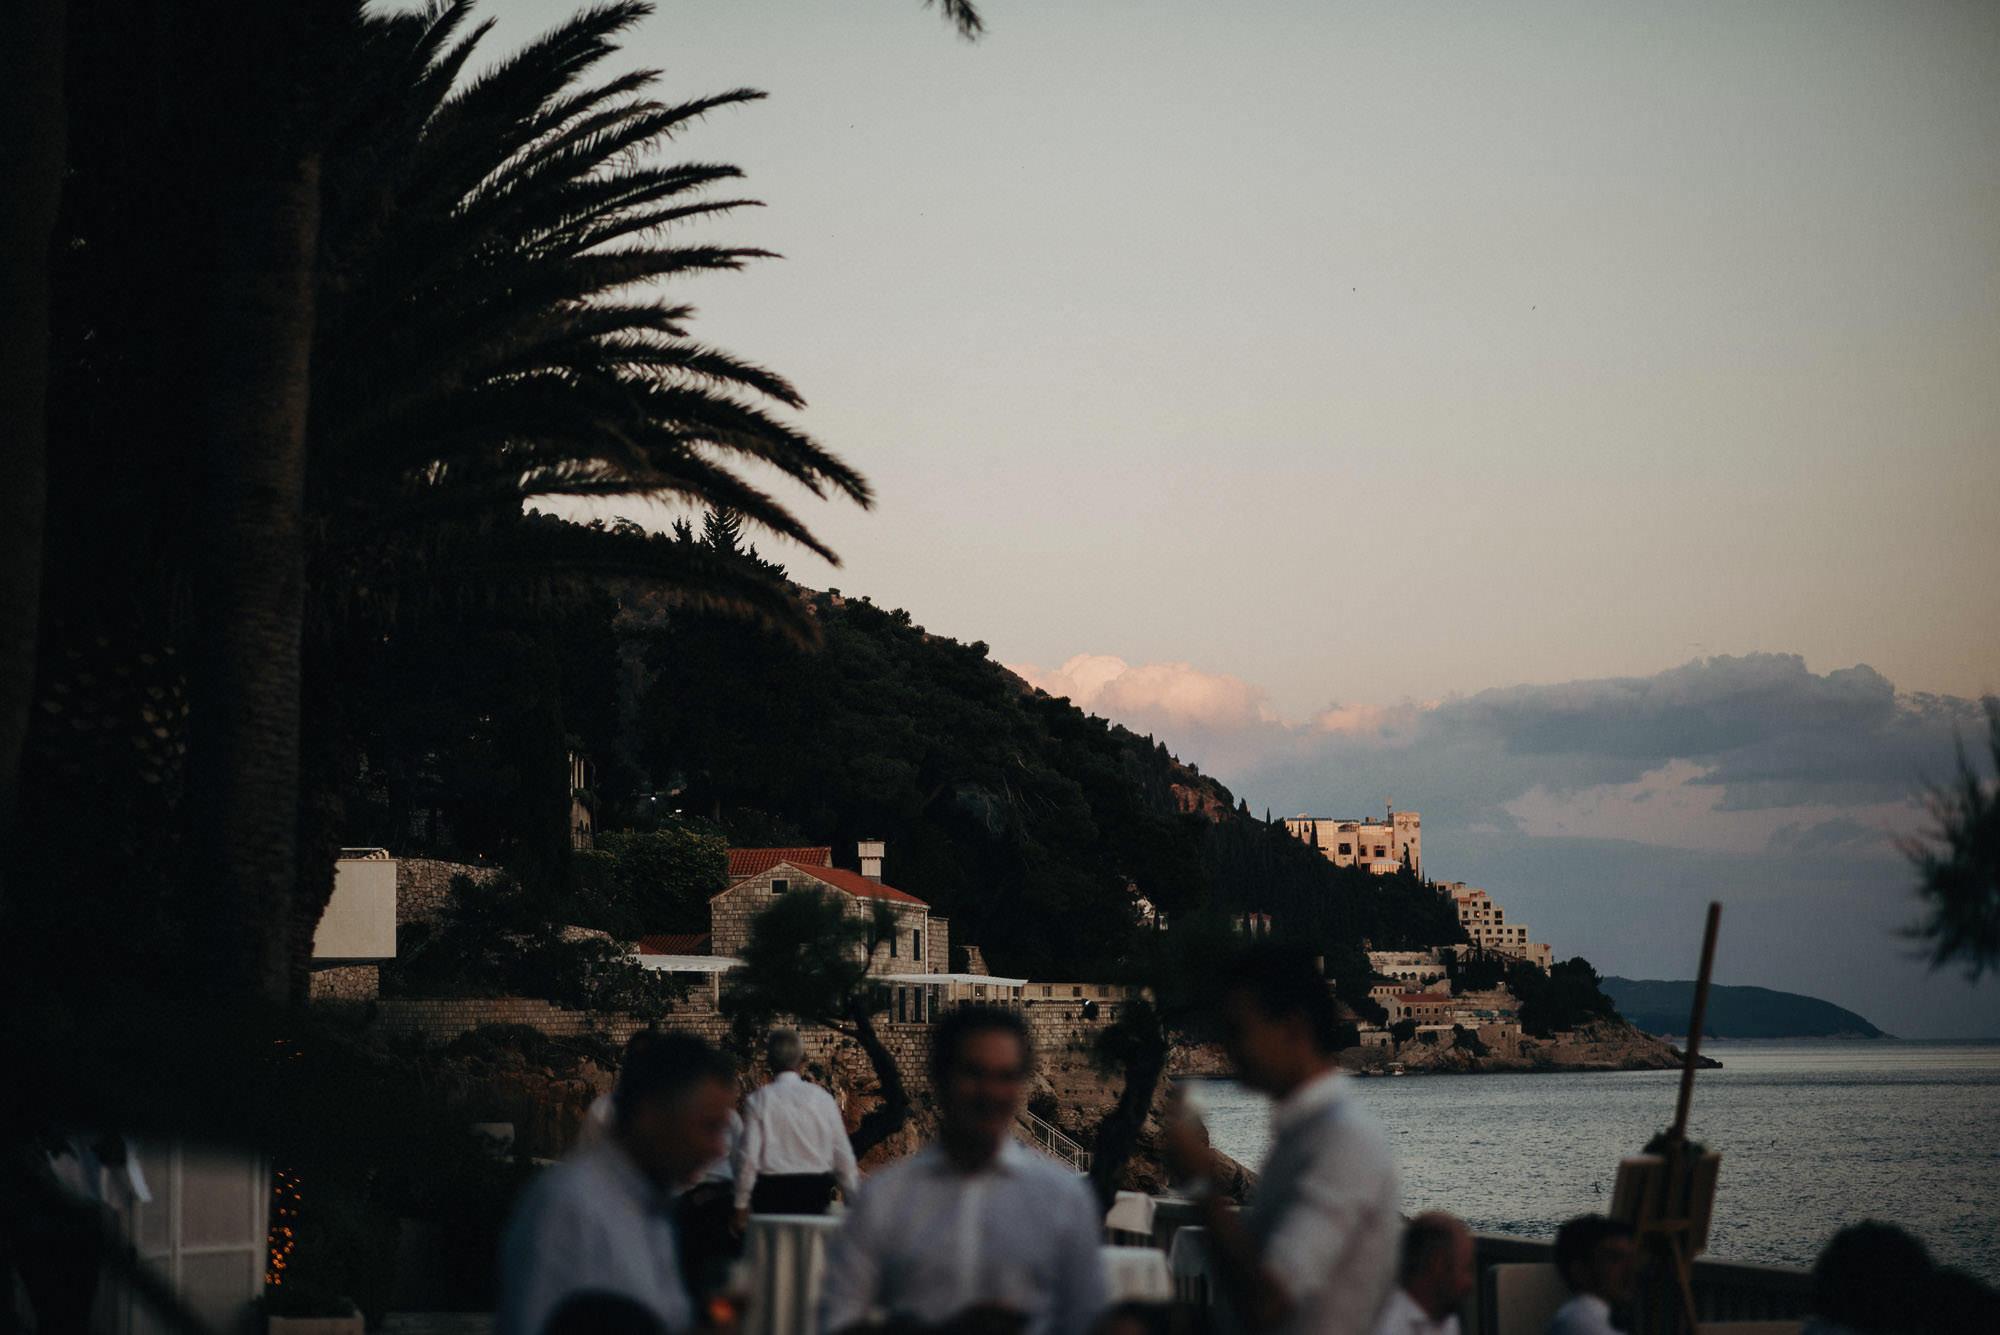 dubrovnik_croatia_wedding_photographer-jere_satamo-destination_weddings-071-web.jpg